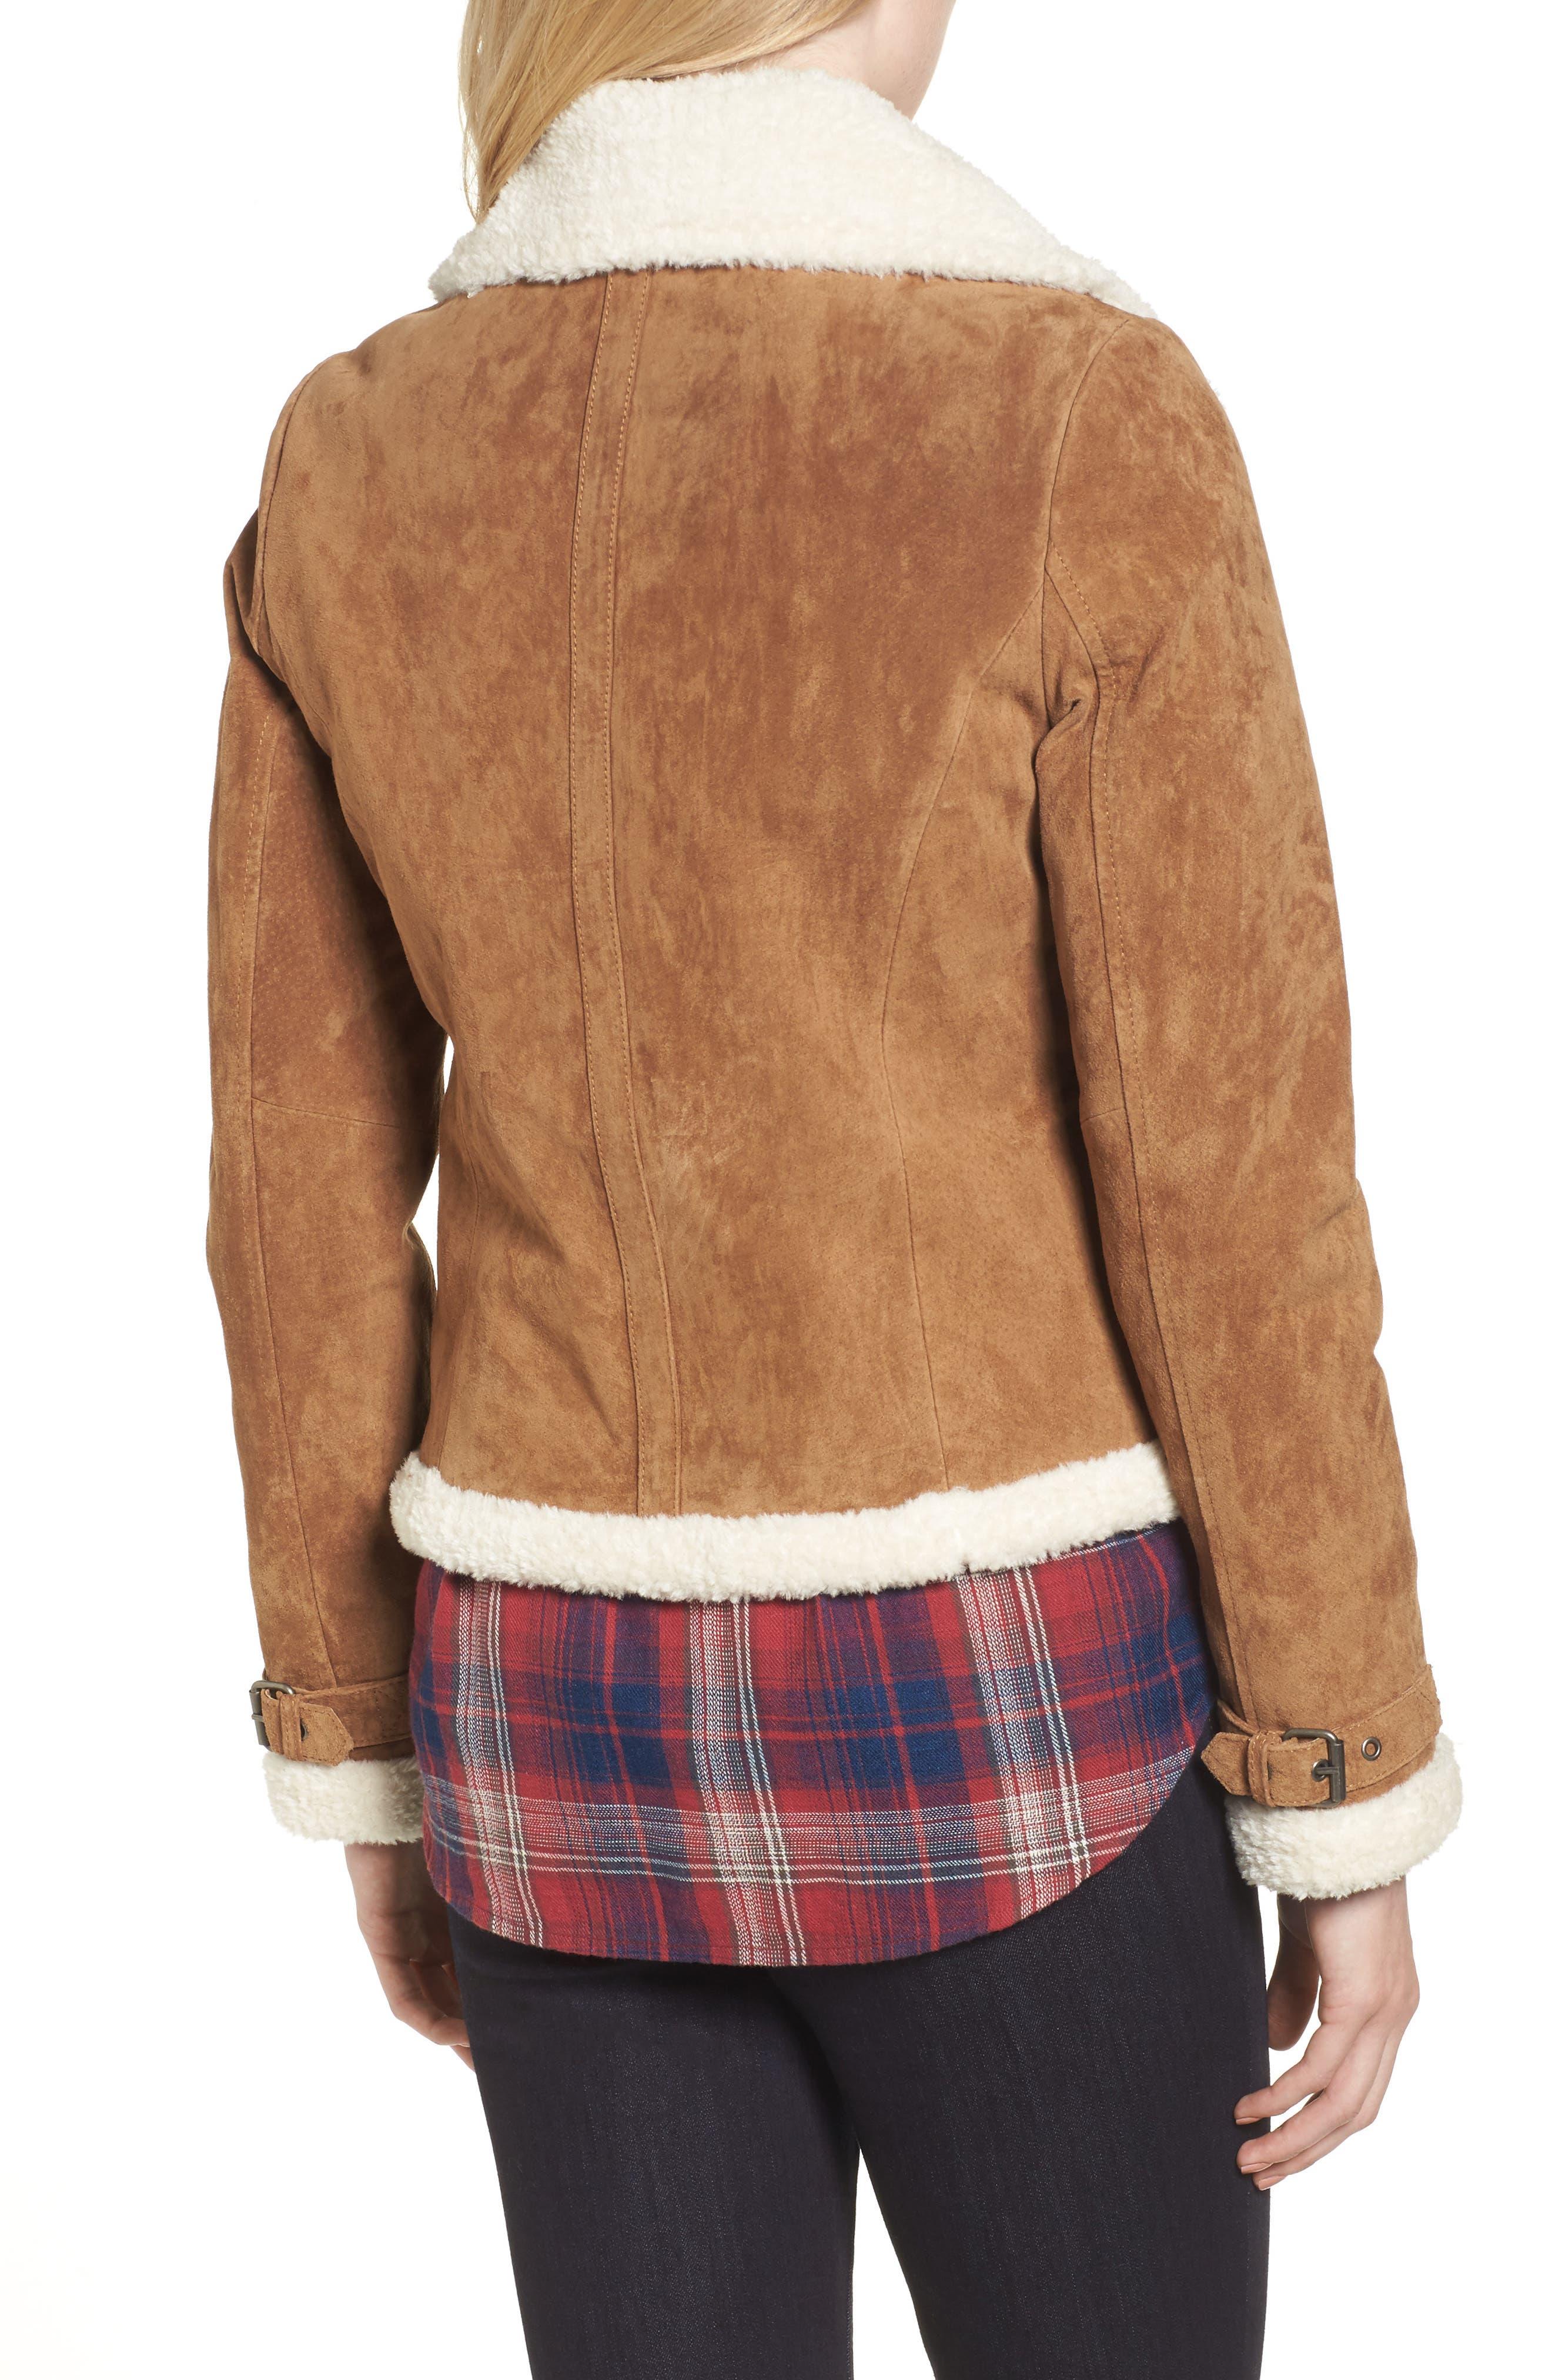 Leather Jacket with Faux Fur Trim,                             Alternate thumbnail 2, color,                             Chestnut